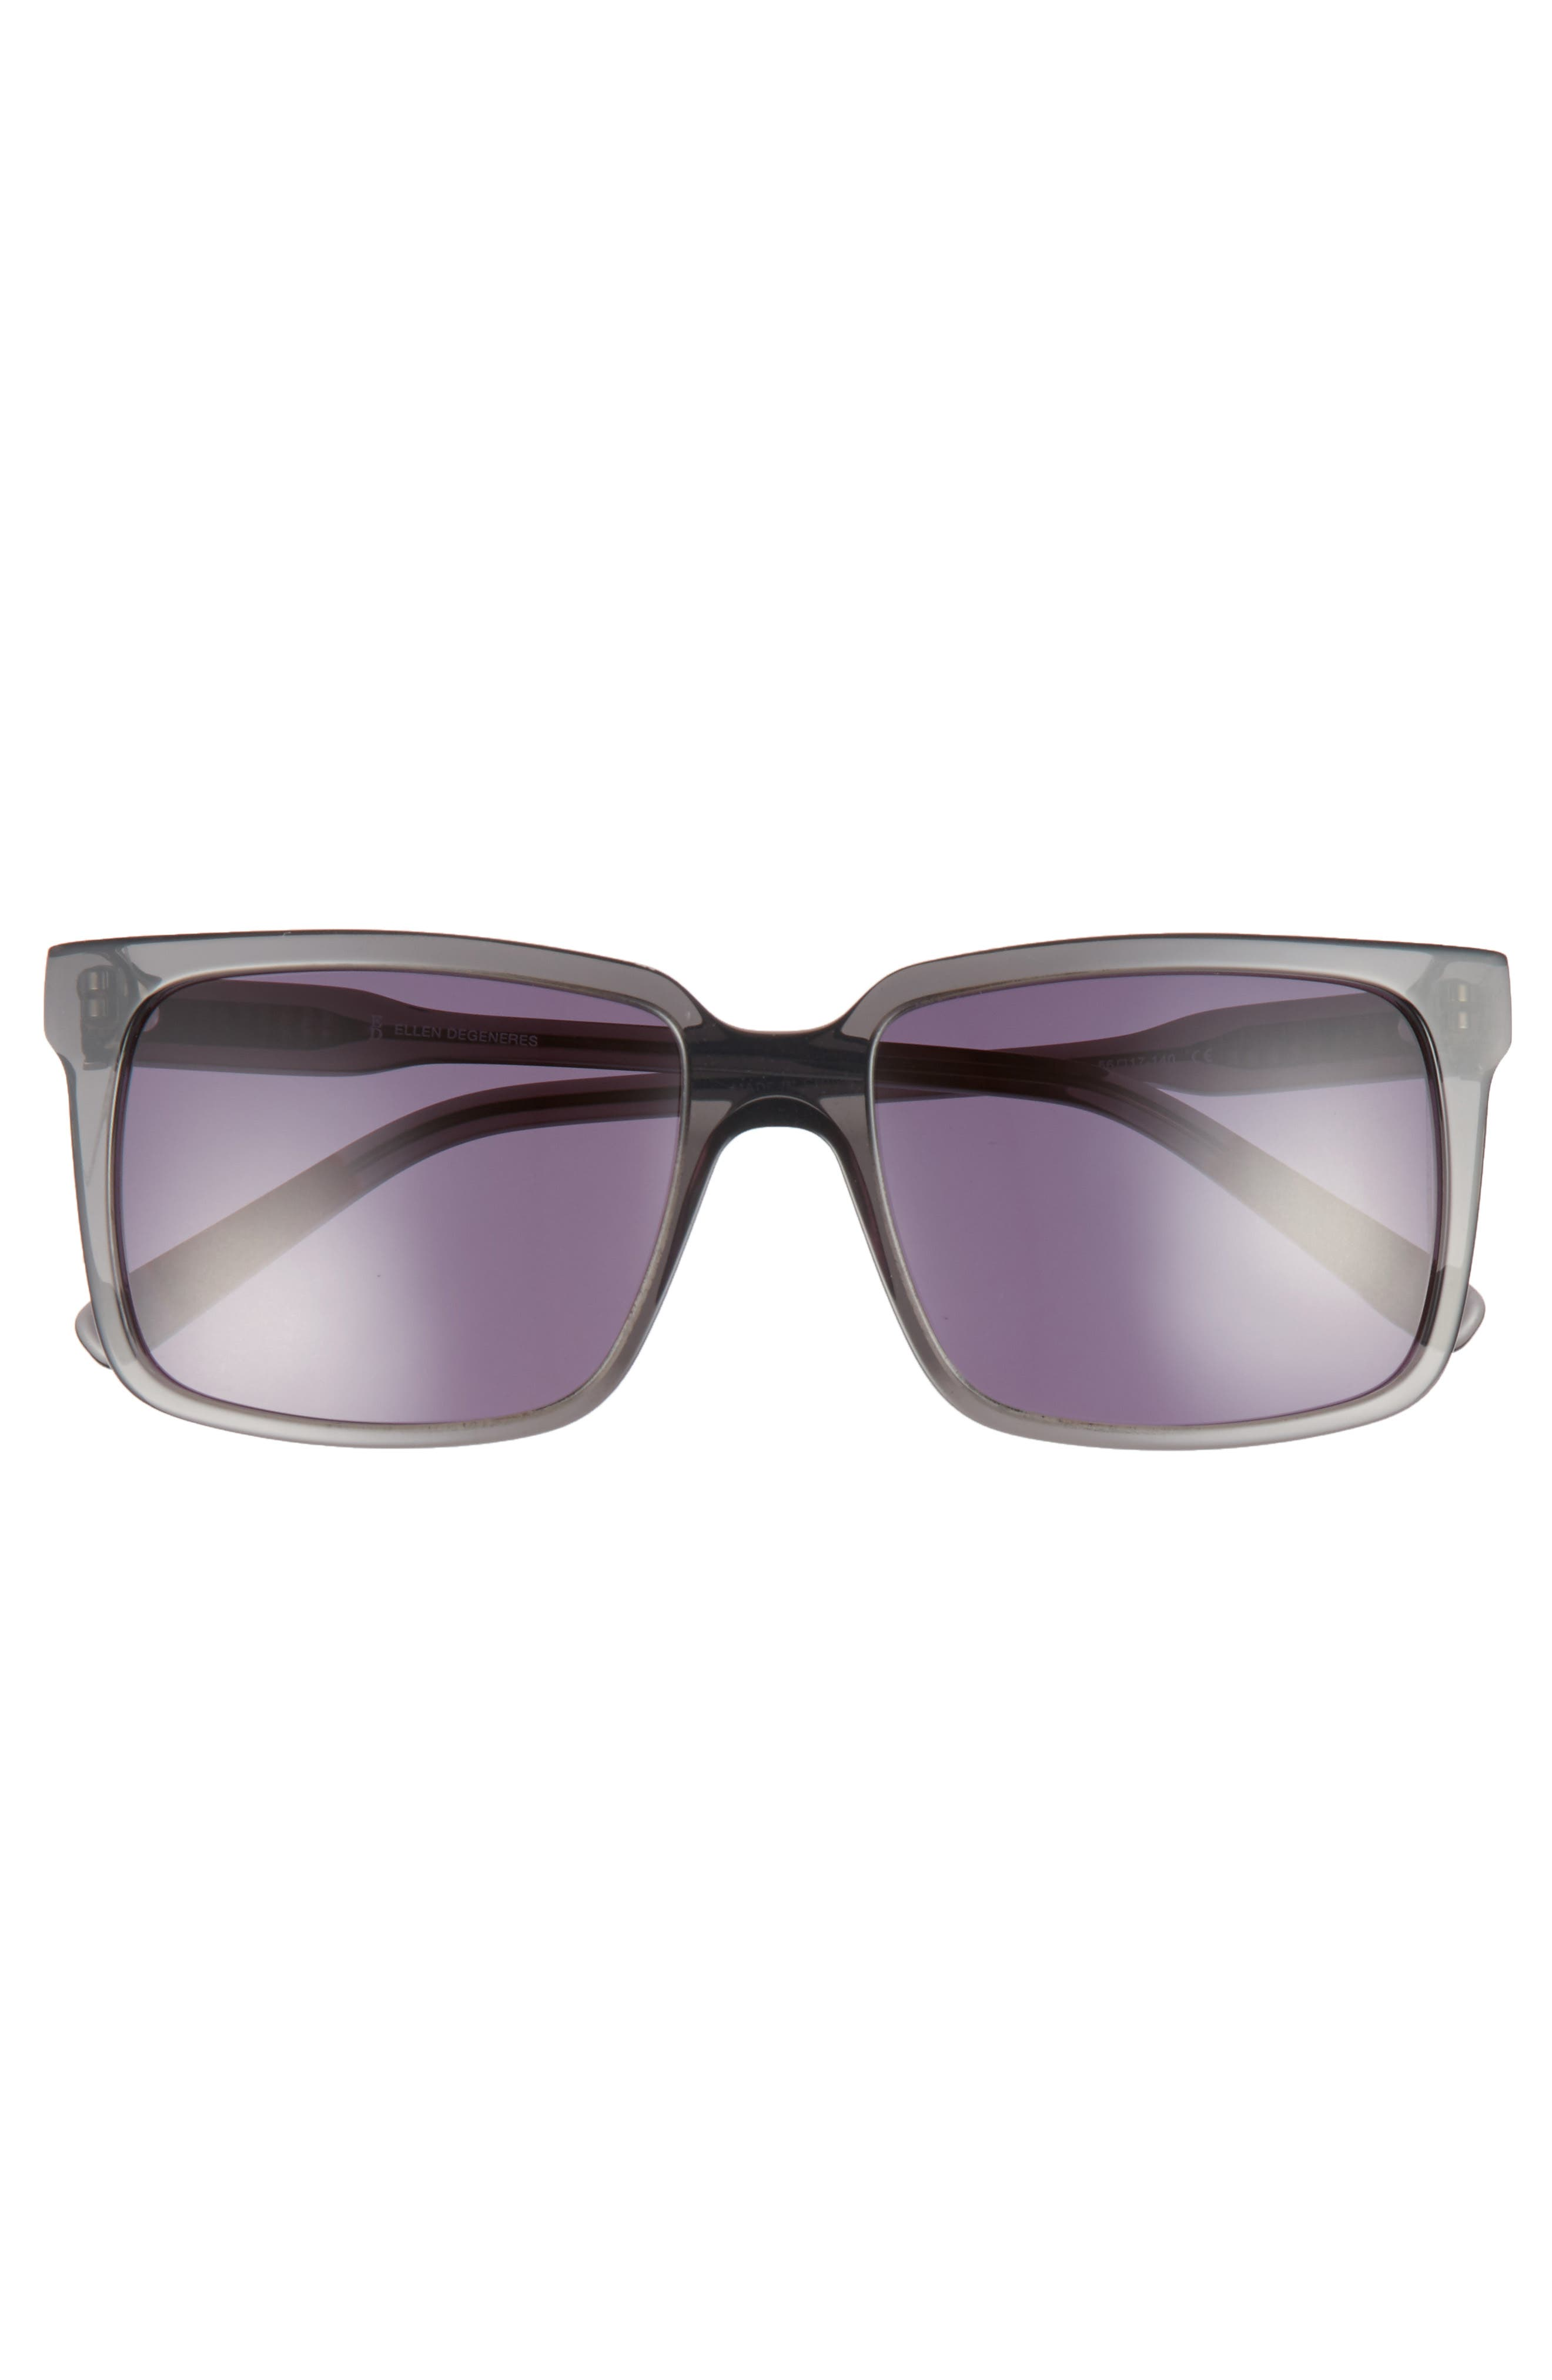 56mm Gradient Square Sunglasses,                             Alternate thumbnail 3, color,                             DARK GREY